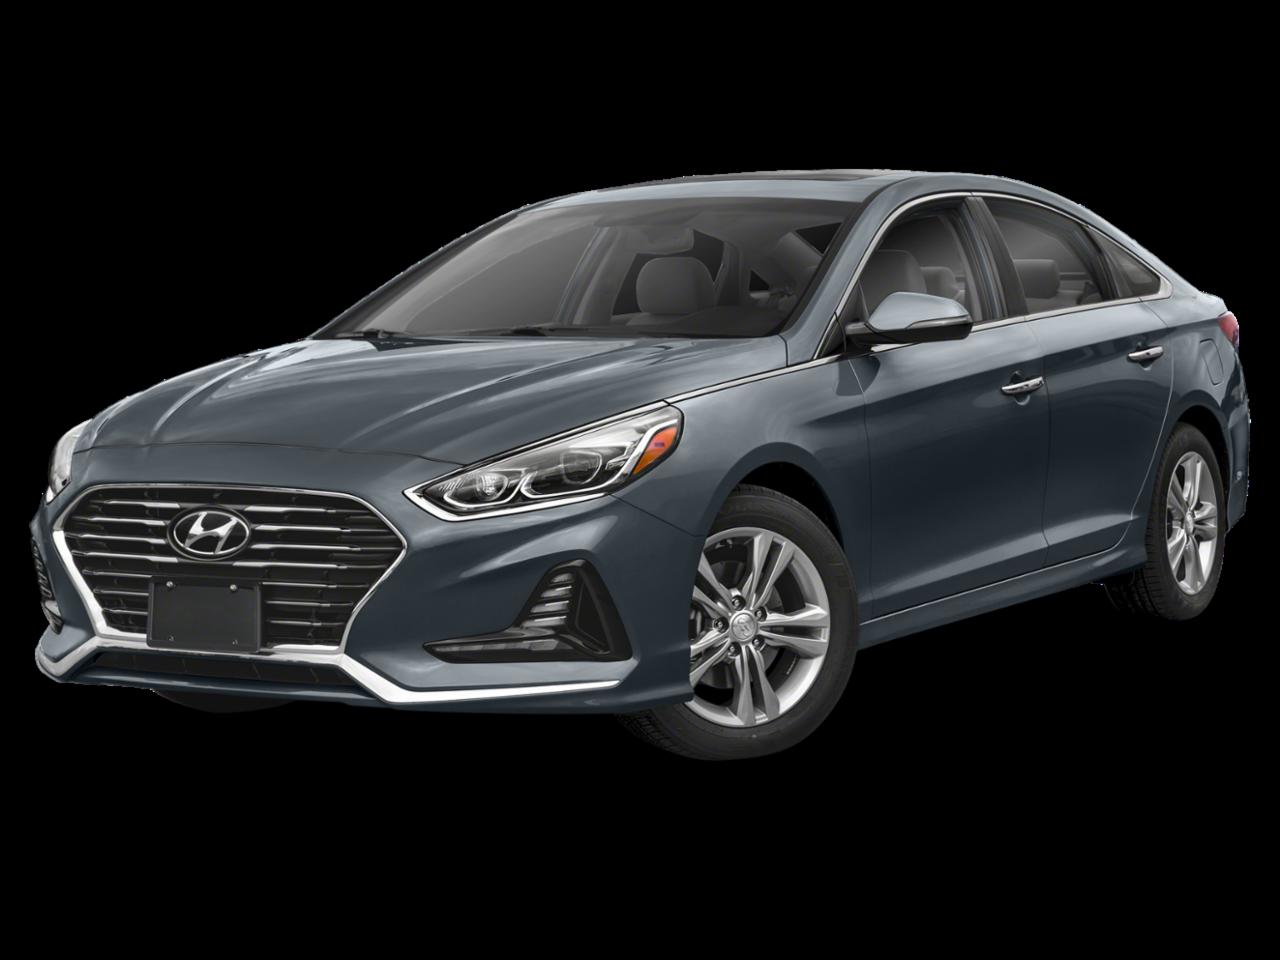 Hyundai 2019 Sonata Limited